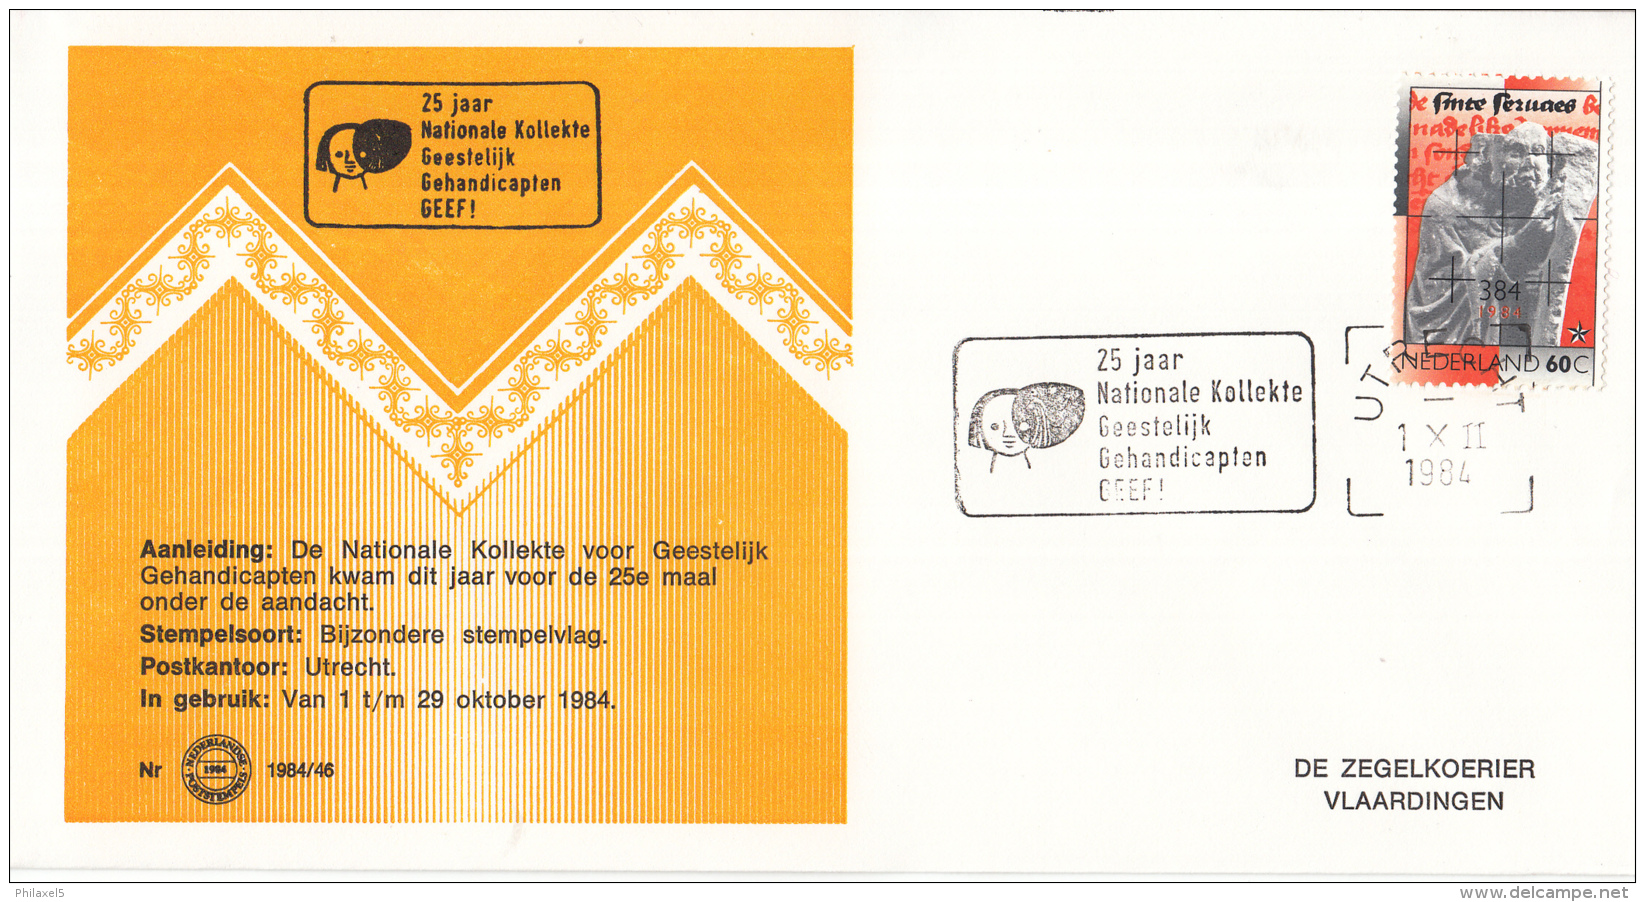 Nederland - Zegelkoerier Nederlandse Poststempels - 25 Jaar Nationale Kollekte Geestelijk Gehandicapten - Nr. 1984/46 - Marcofilie - EMA (Print Machine)